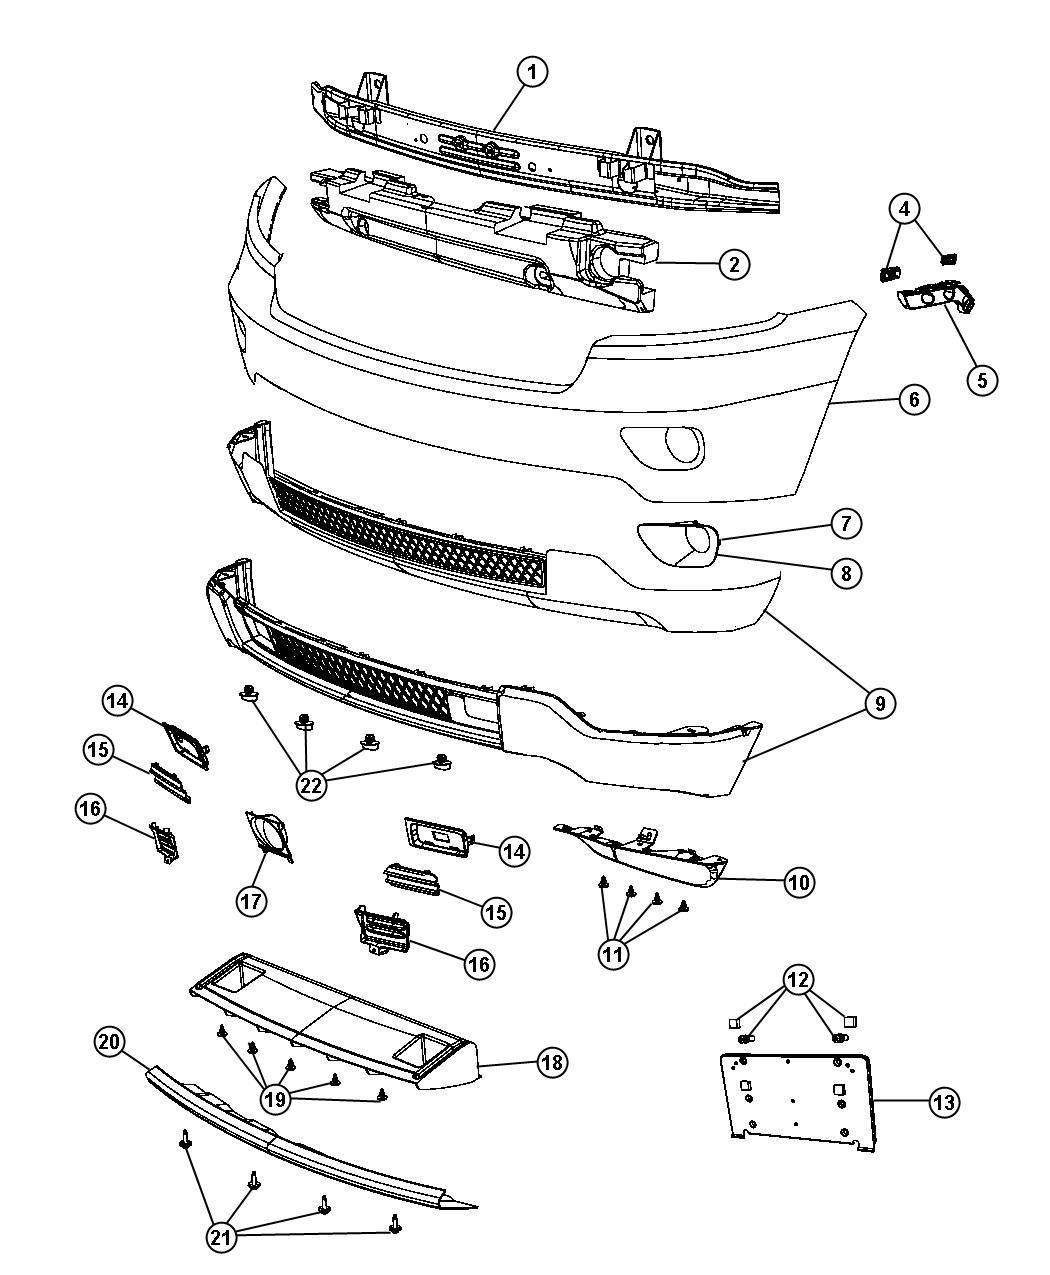 Wk2 Jet Edition Parts